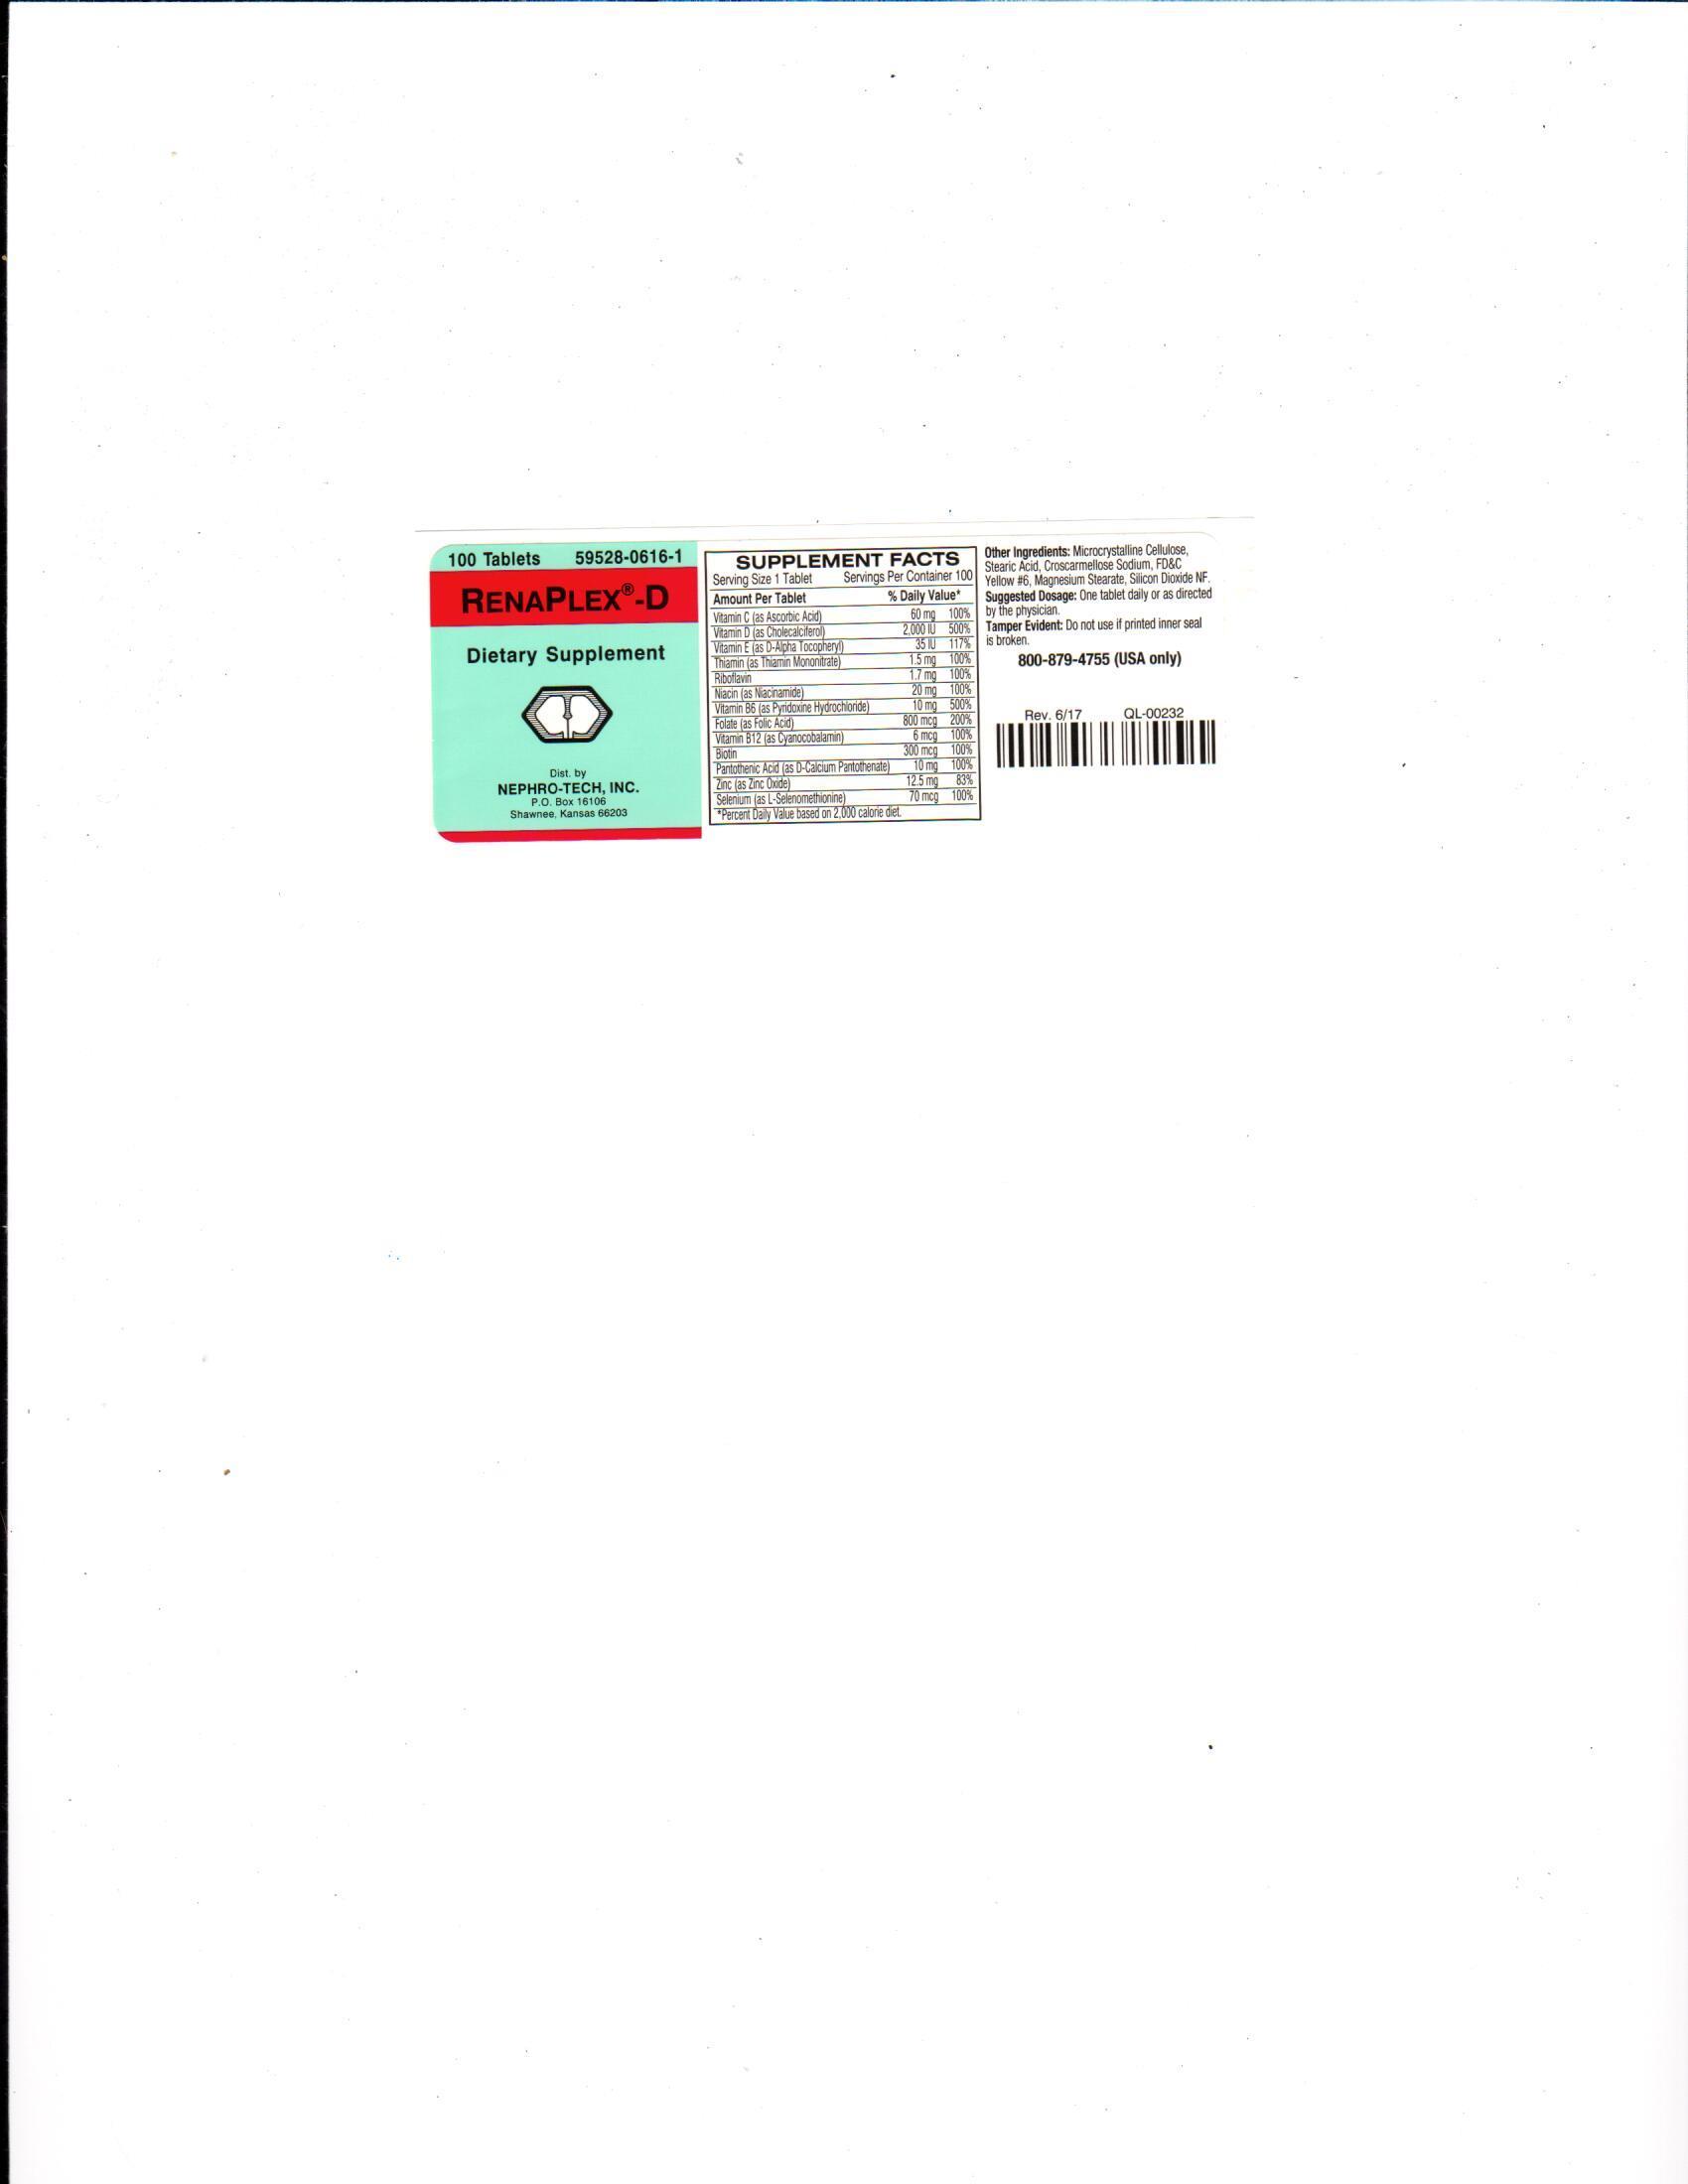 RenaPlex D label